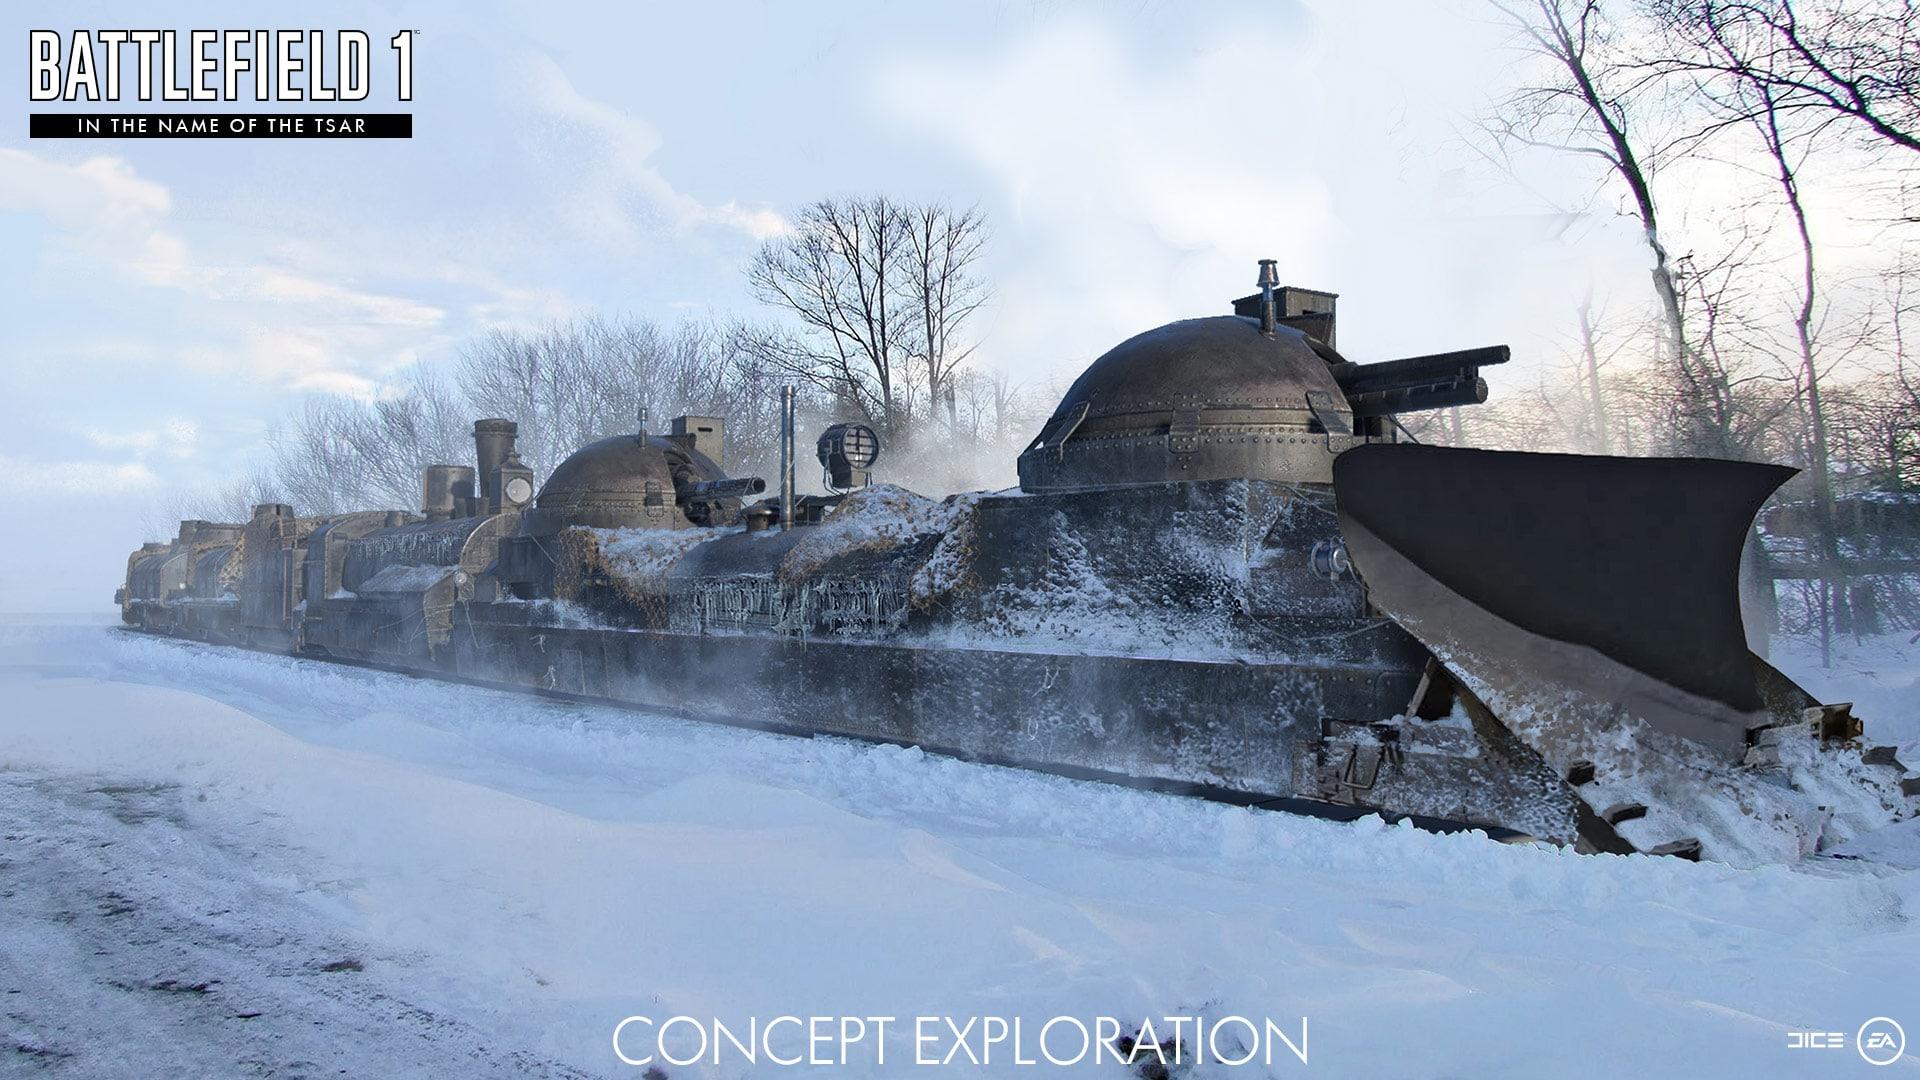 Battlefield-1-In-The-Name-Of-The-Tsar-Concept-Art-2.jpg